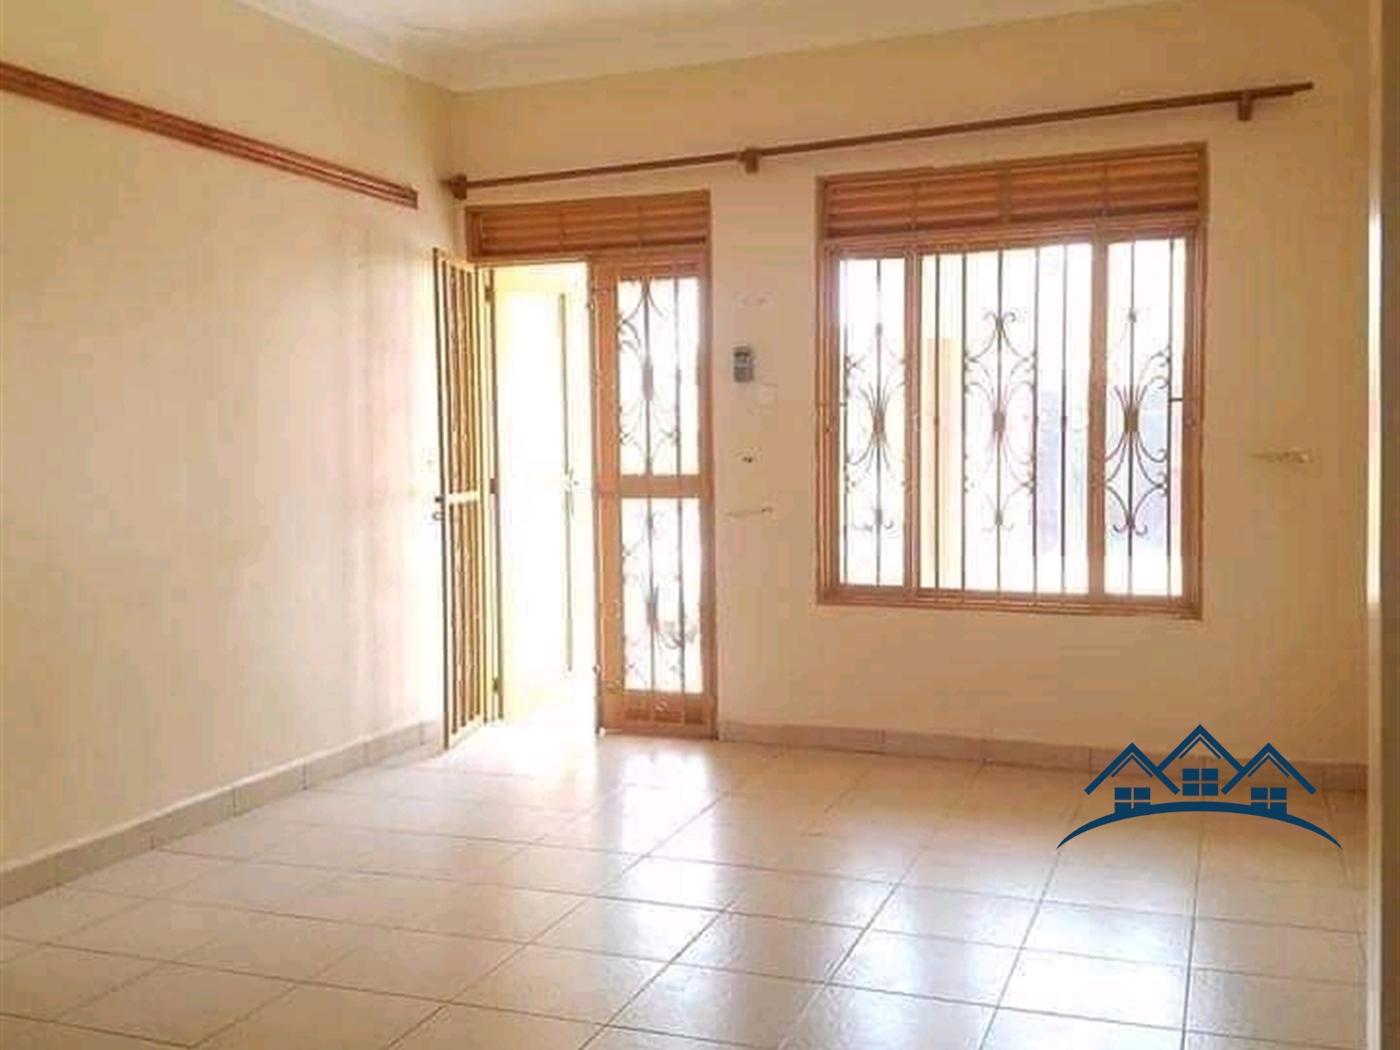 Rental units for rent in Kitetika Wakiso